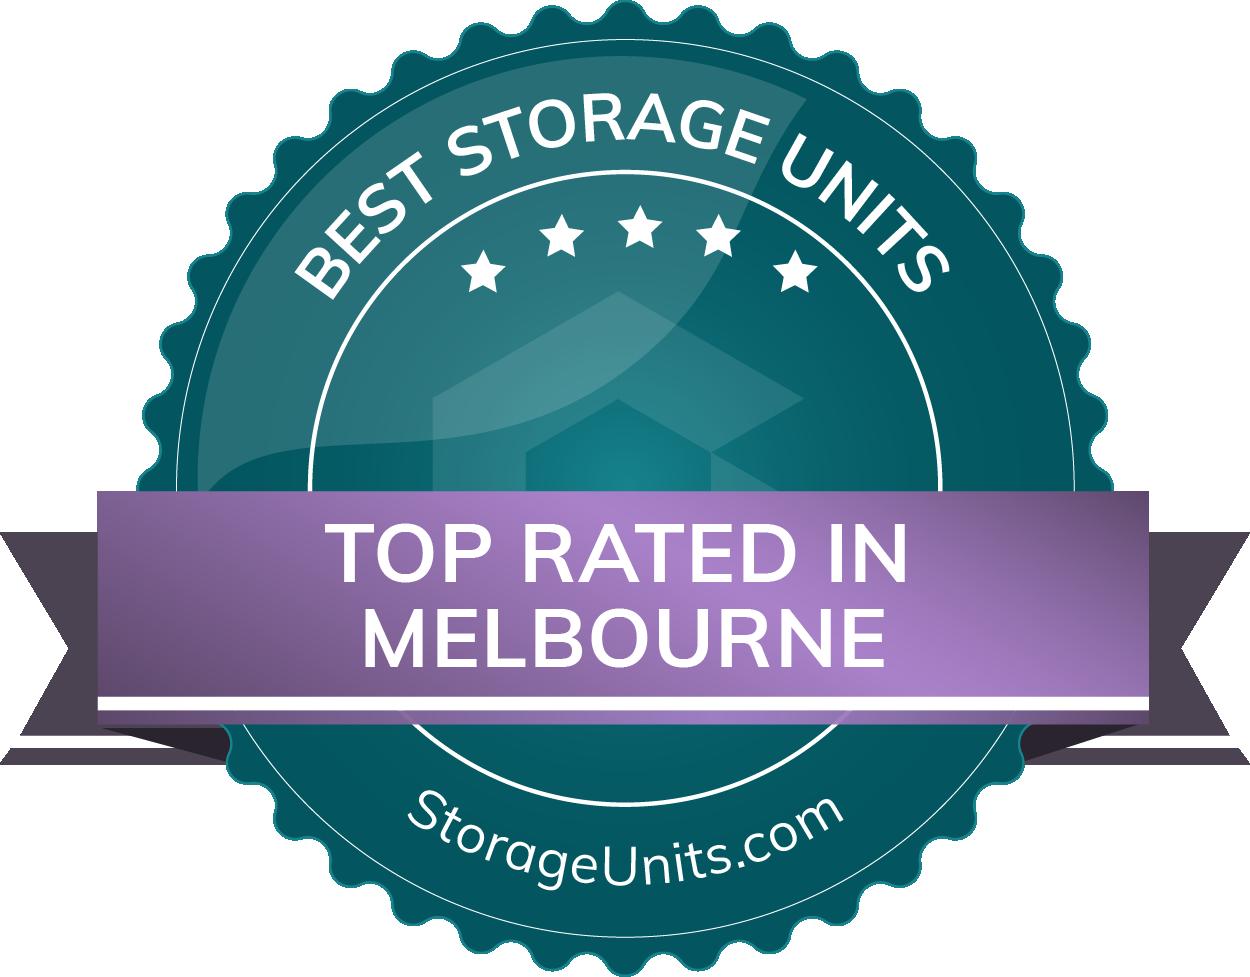 Best Self Storage Units in Melbourne, FL